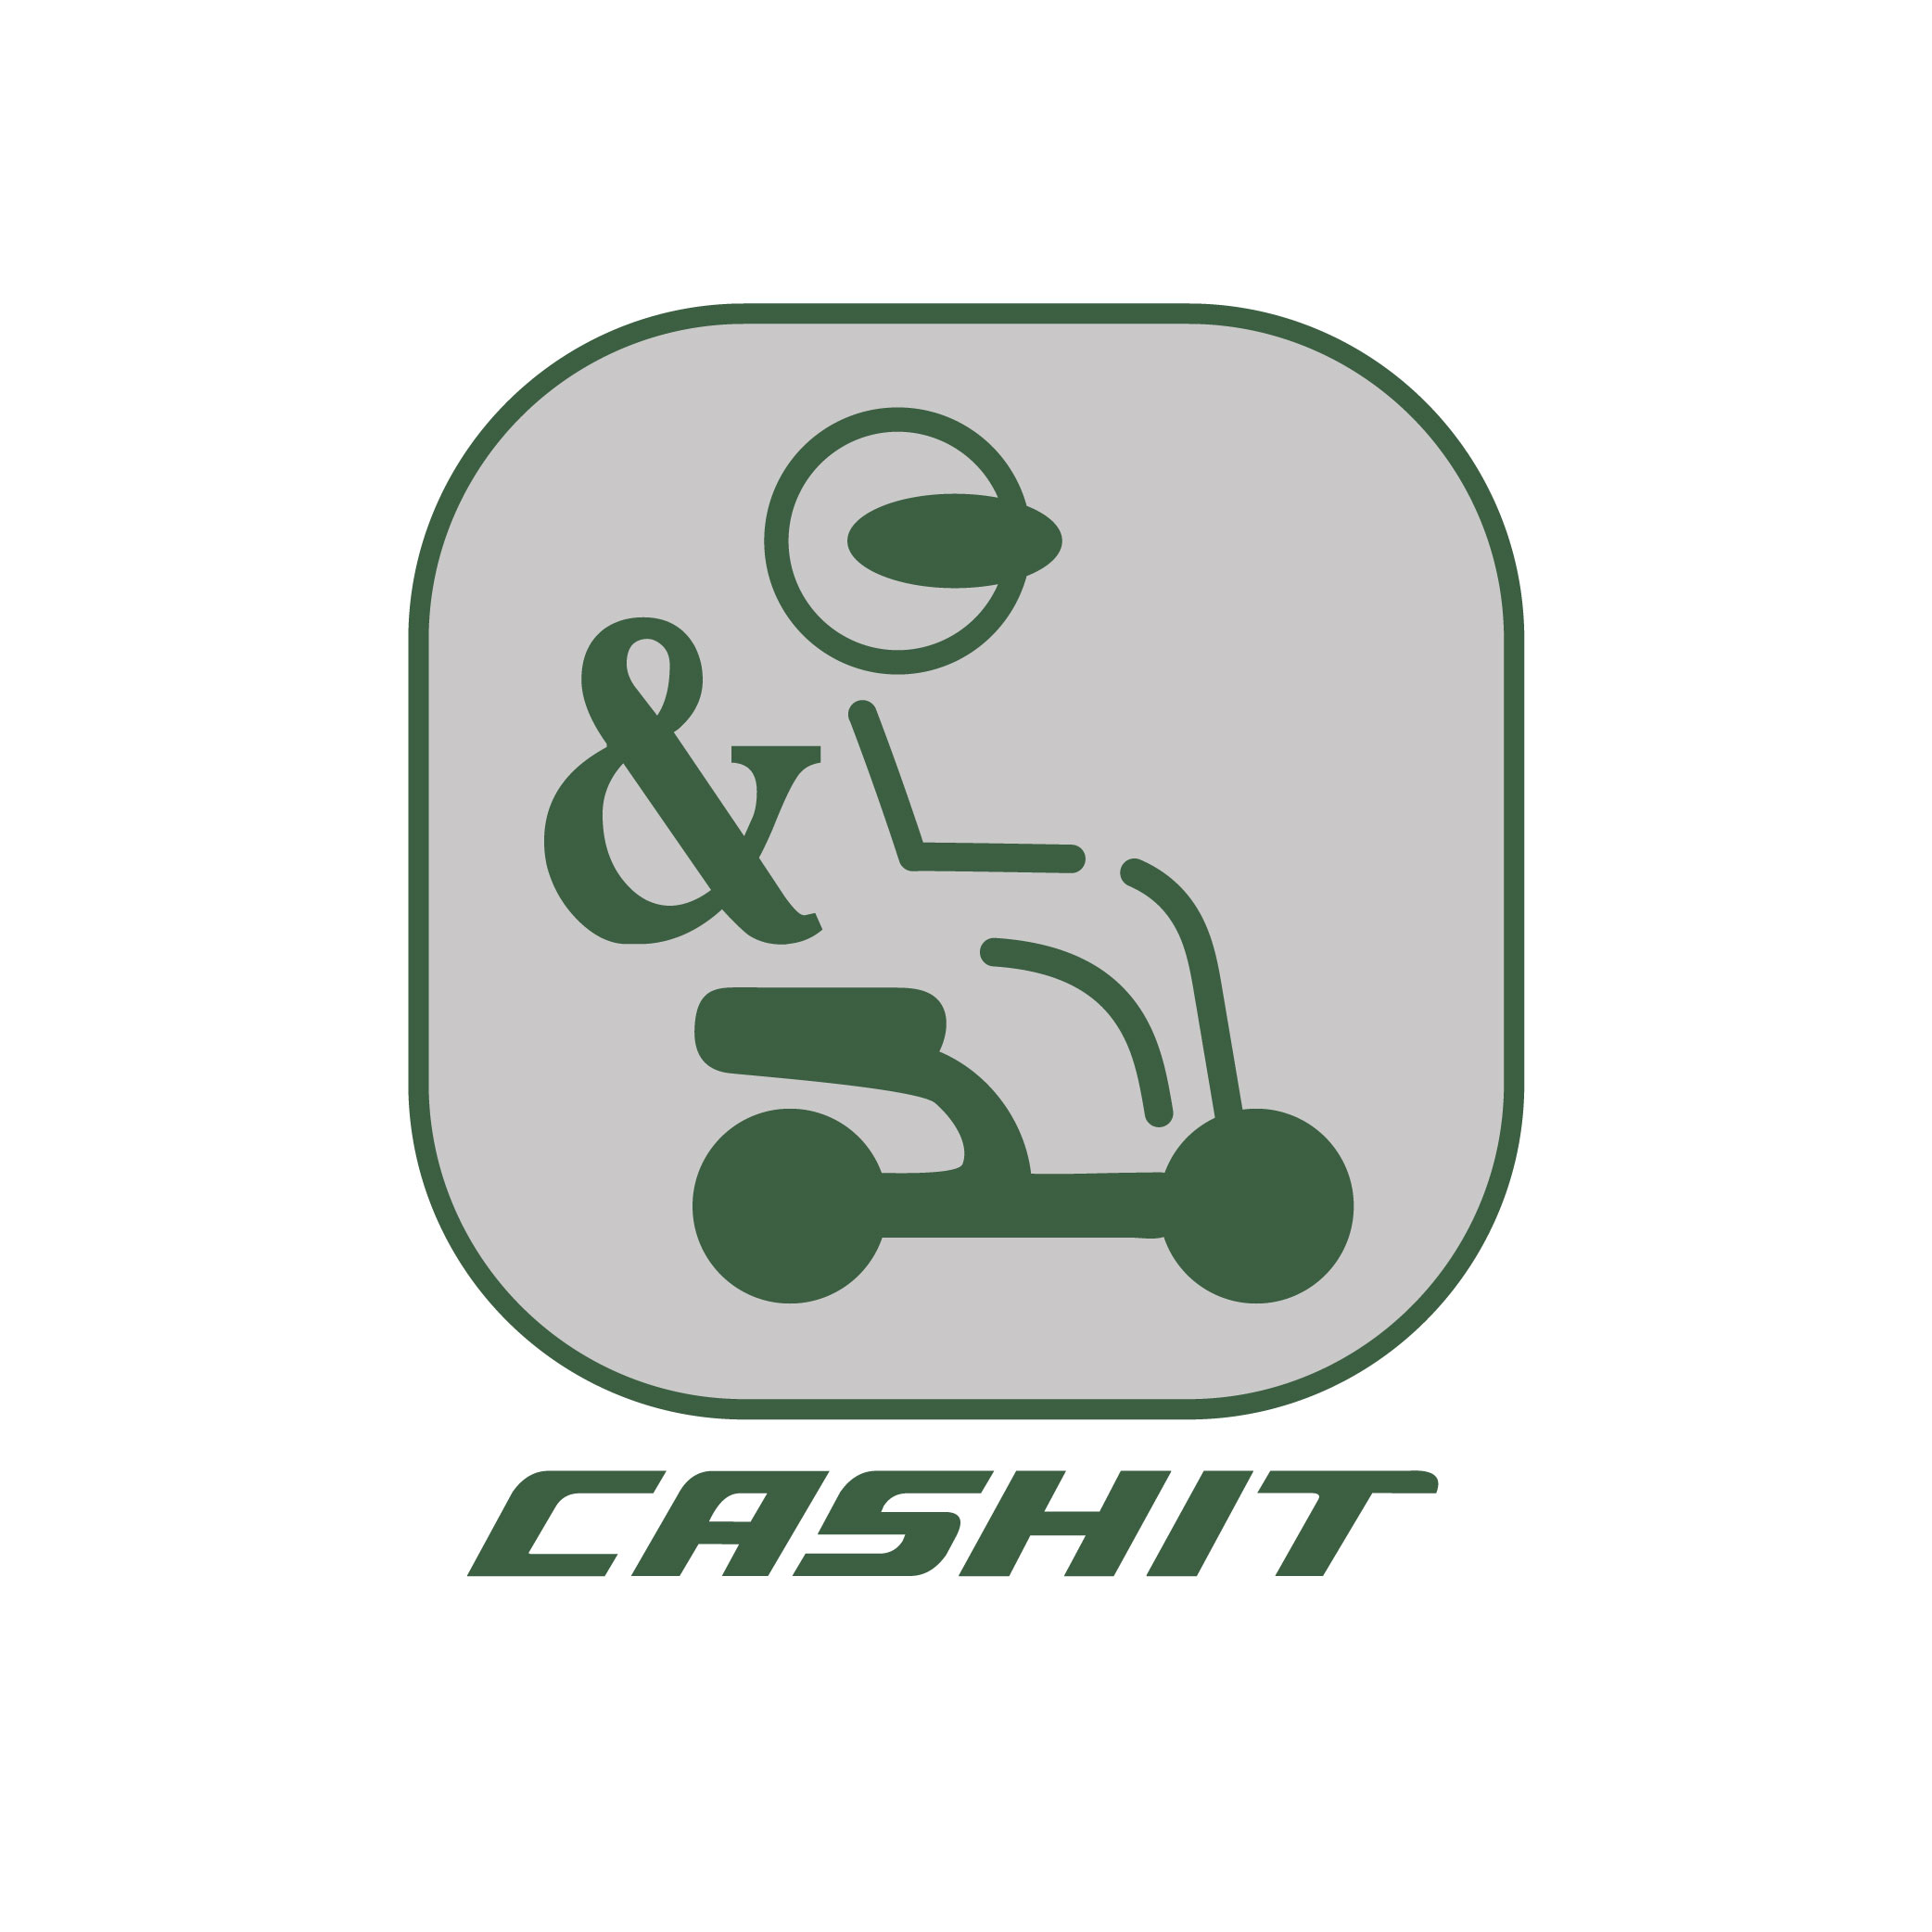 Логотип для Cash & IT - сервис доставки денег фото f_2415fd8354ba2da8.jpg